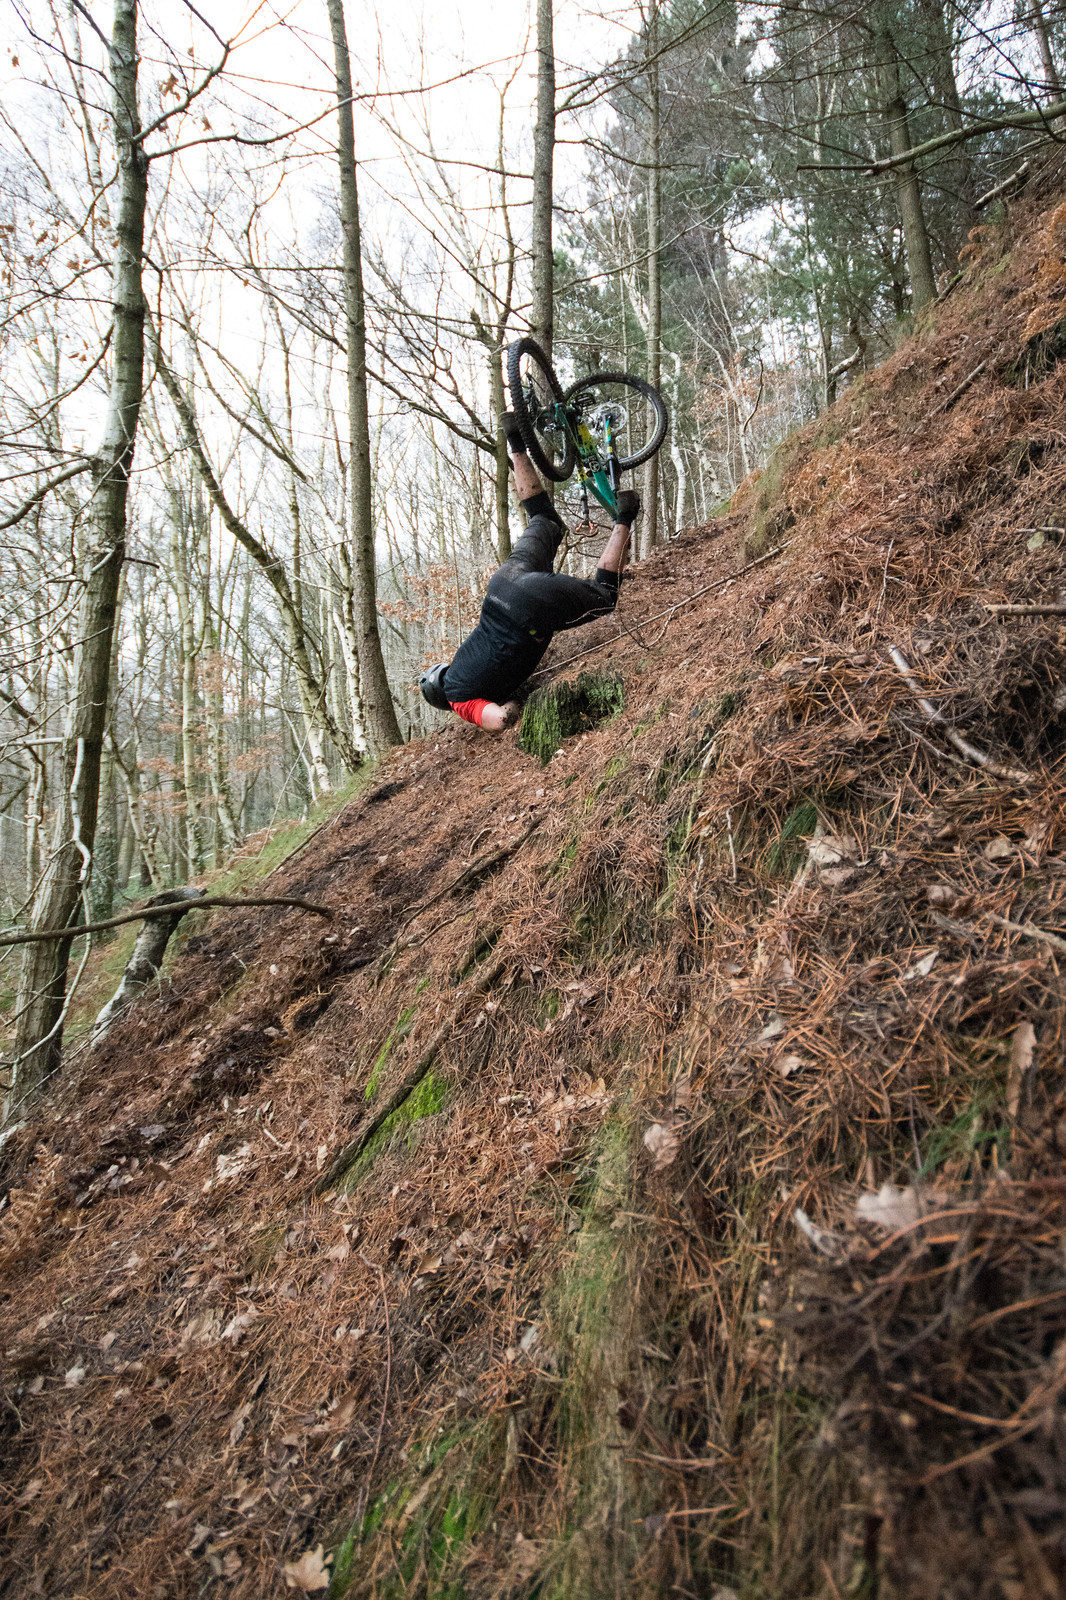 DSC 2237 - 89dn11 - Mountain Biking Pictures - Vital MTB